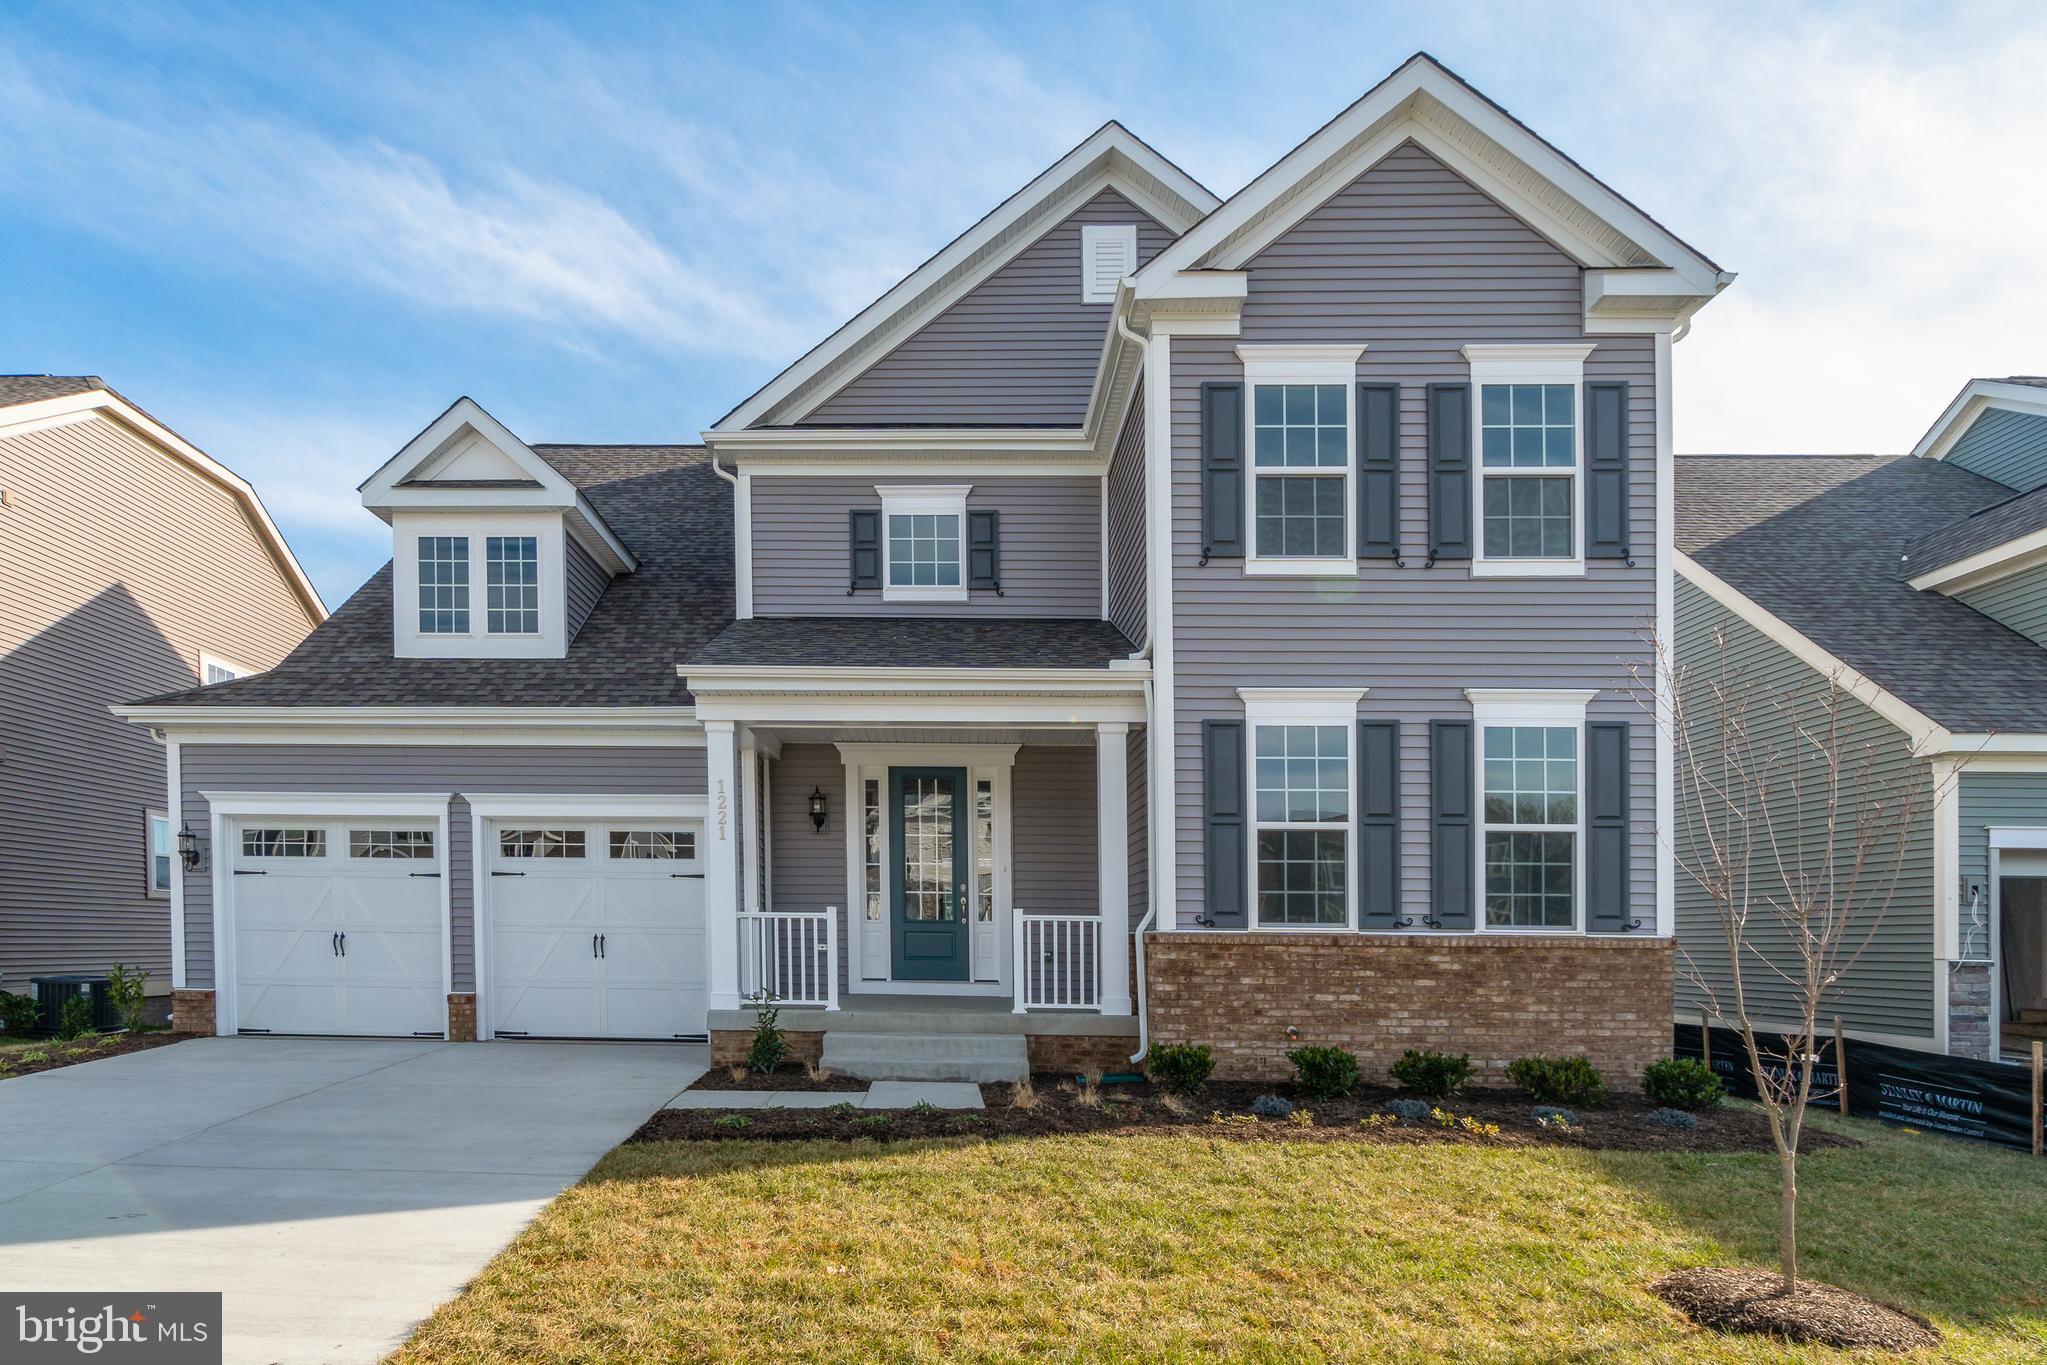 1221 Marigold St, Stafford, VA, 22554